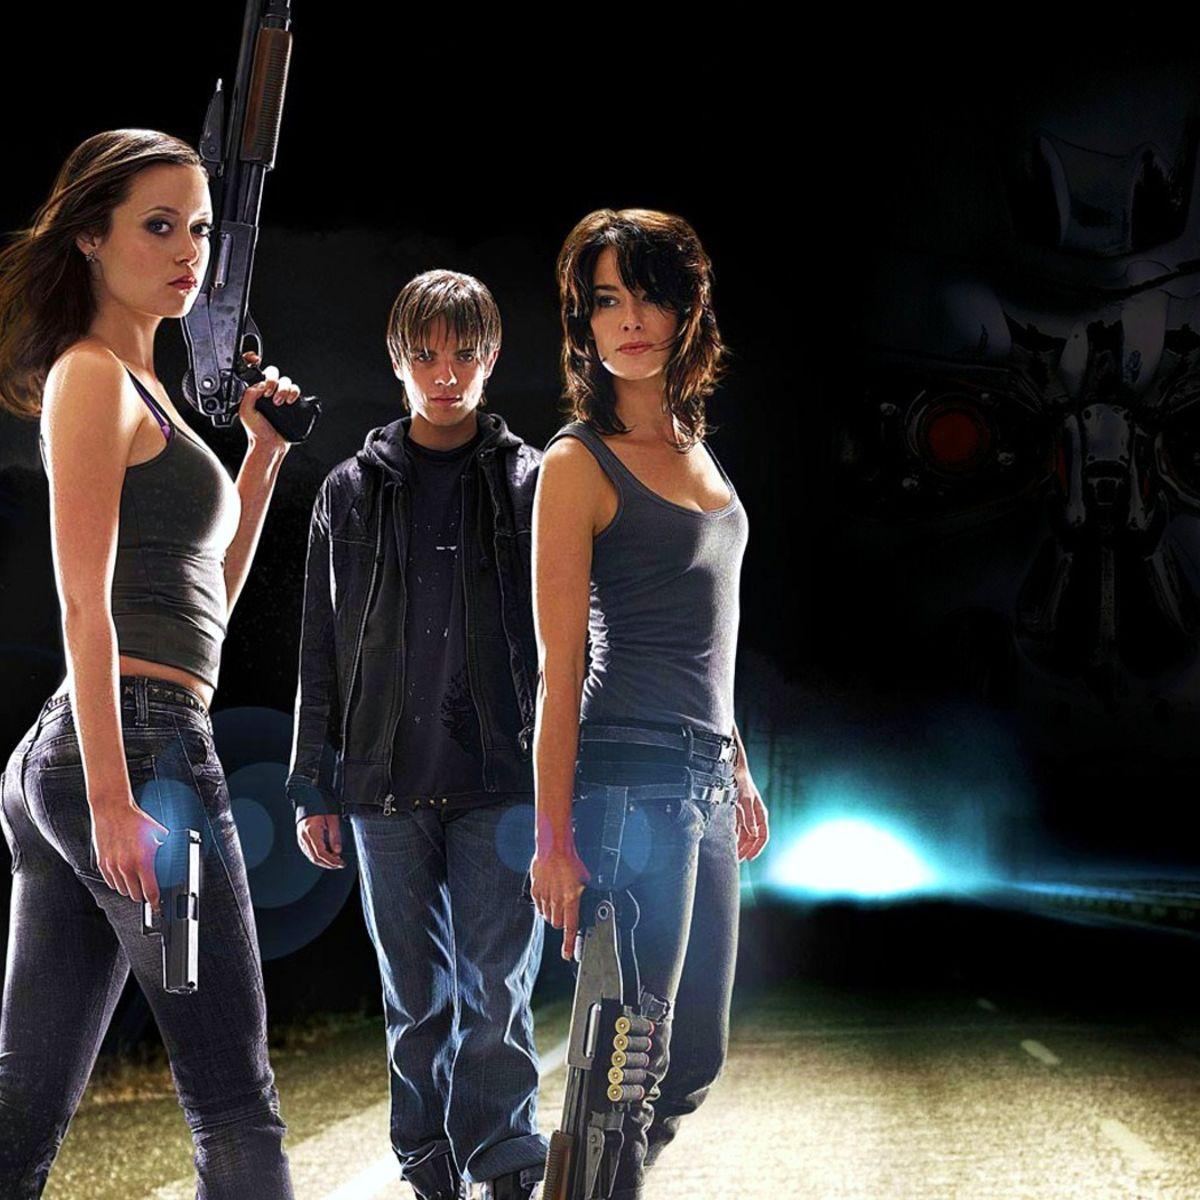 Terminator-Sarah-Connor-Chronicles-cameron-phillips-terminator-scc-24508864-1680-1050.jpg